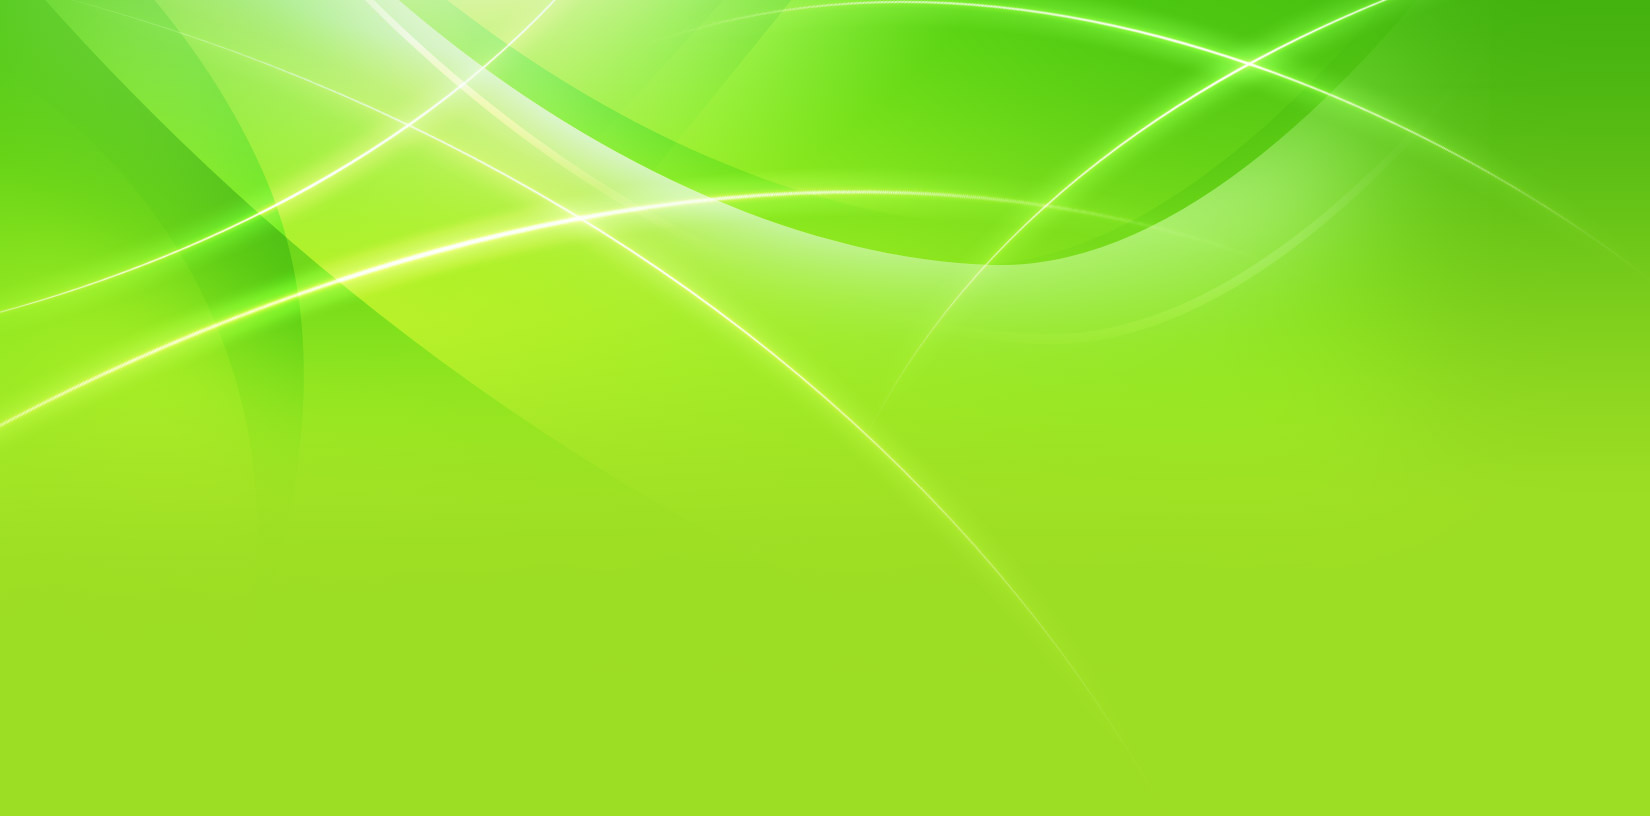 Digital Plain Green Wallpaper